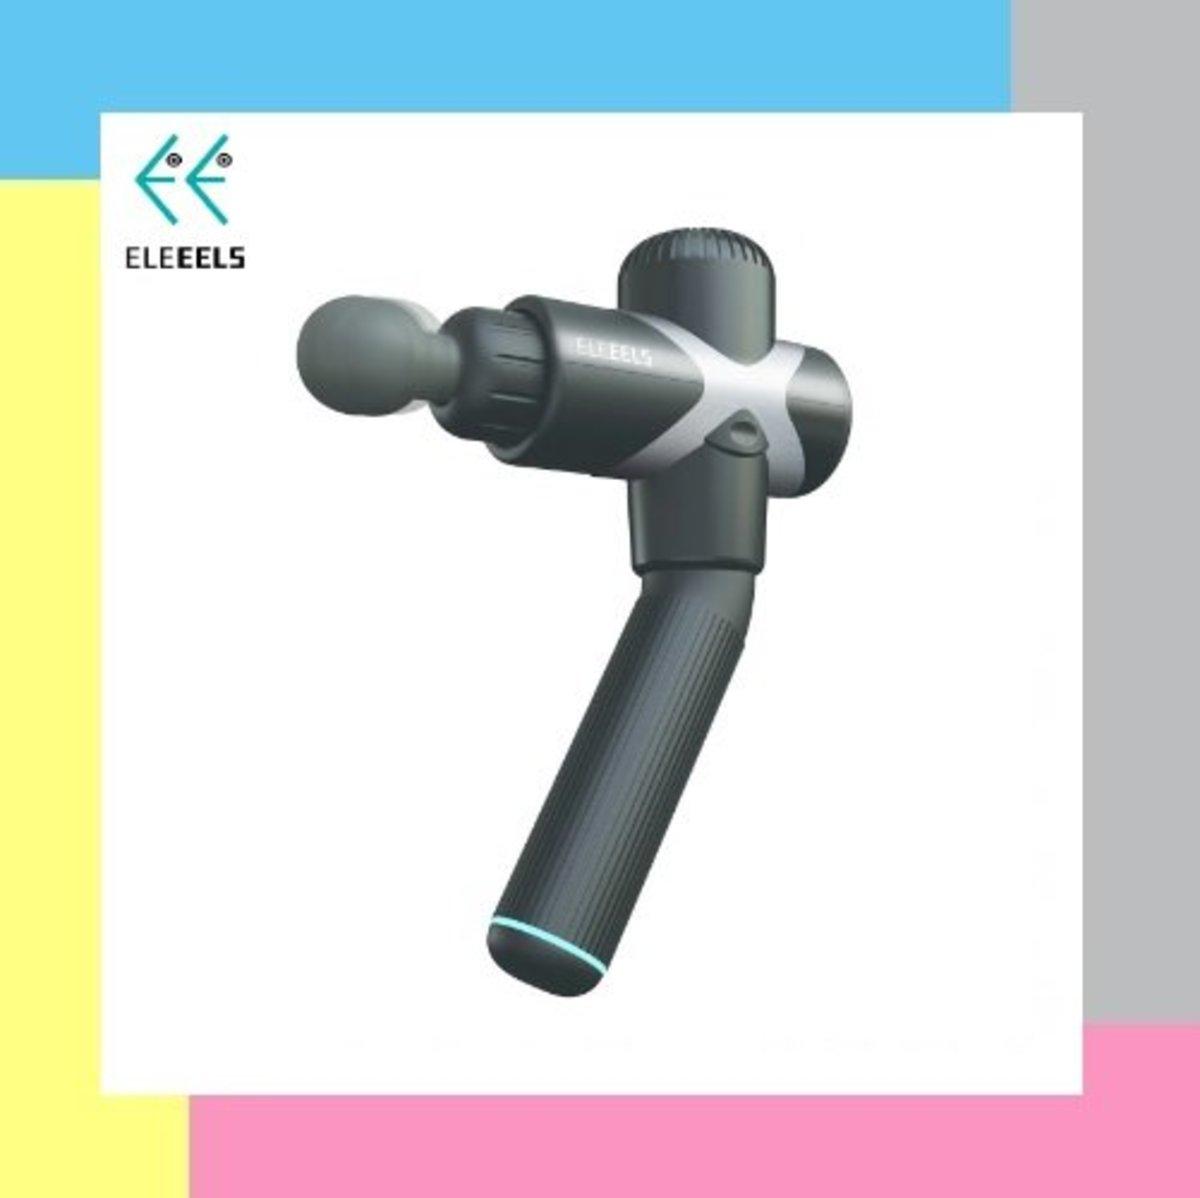 X1T Vibration Massage Gun - Black